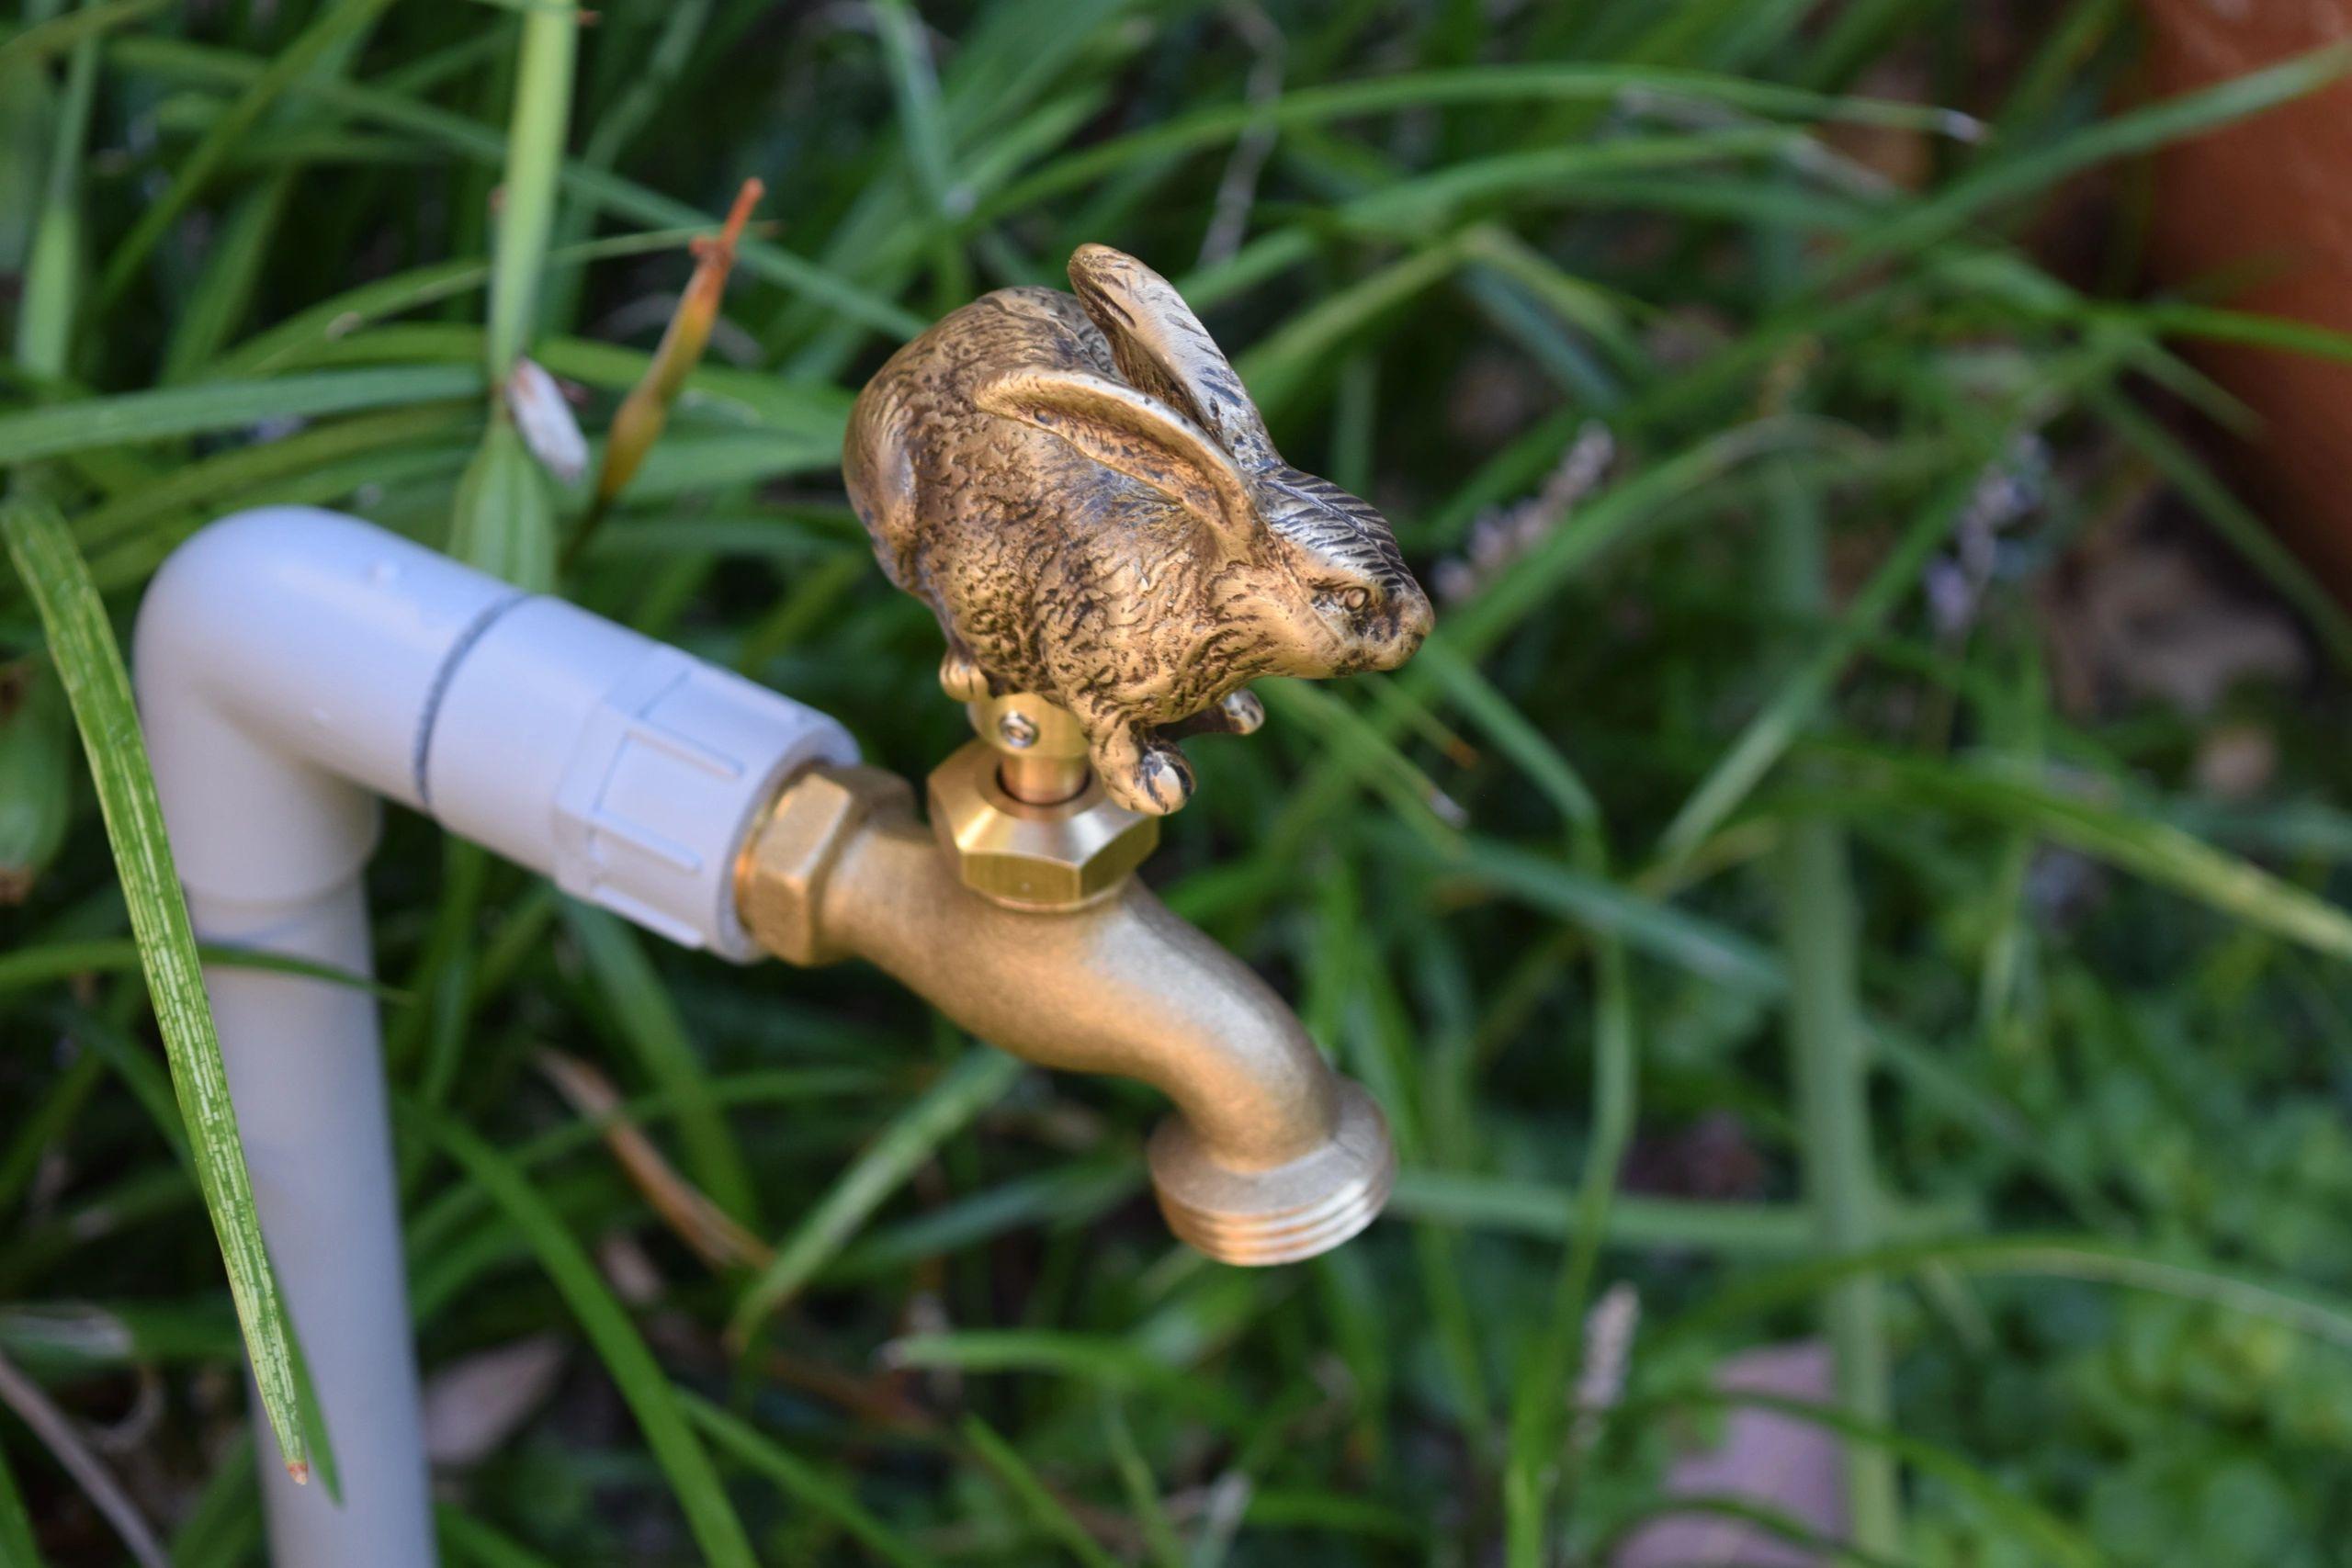 Decorative Outdoor Faucet Handles - Decorative Outdoor Faucet Handle